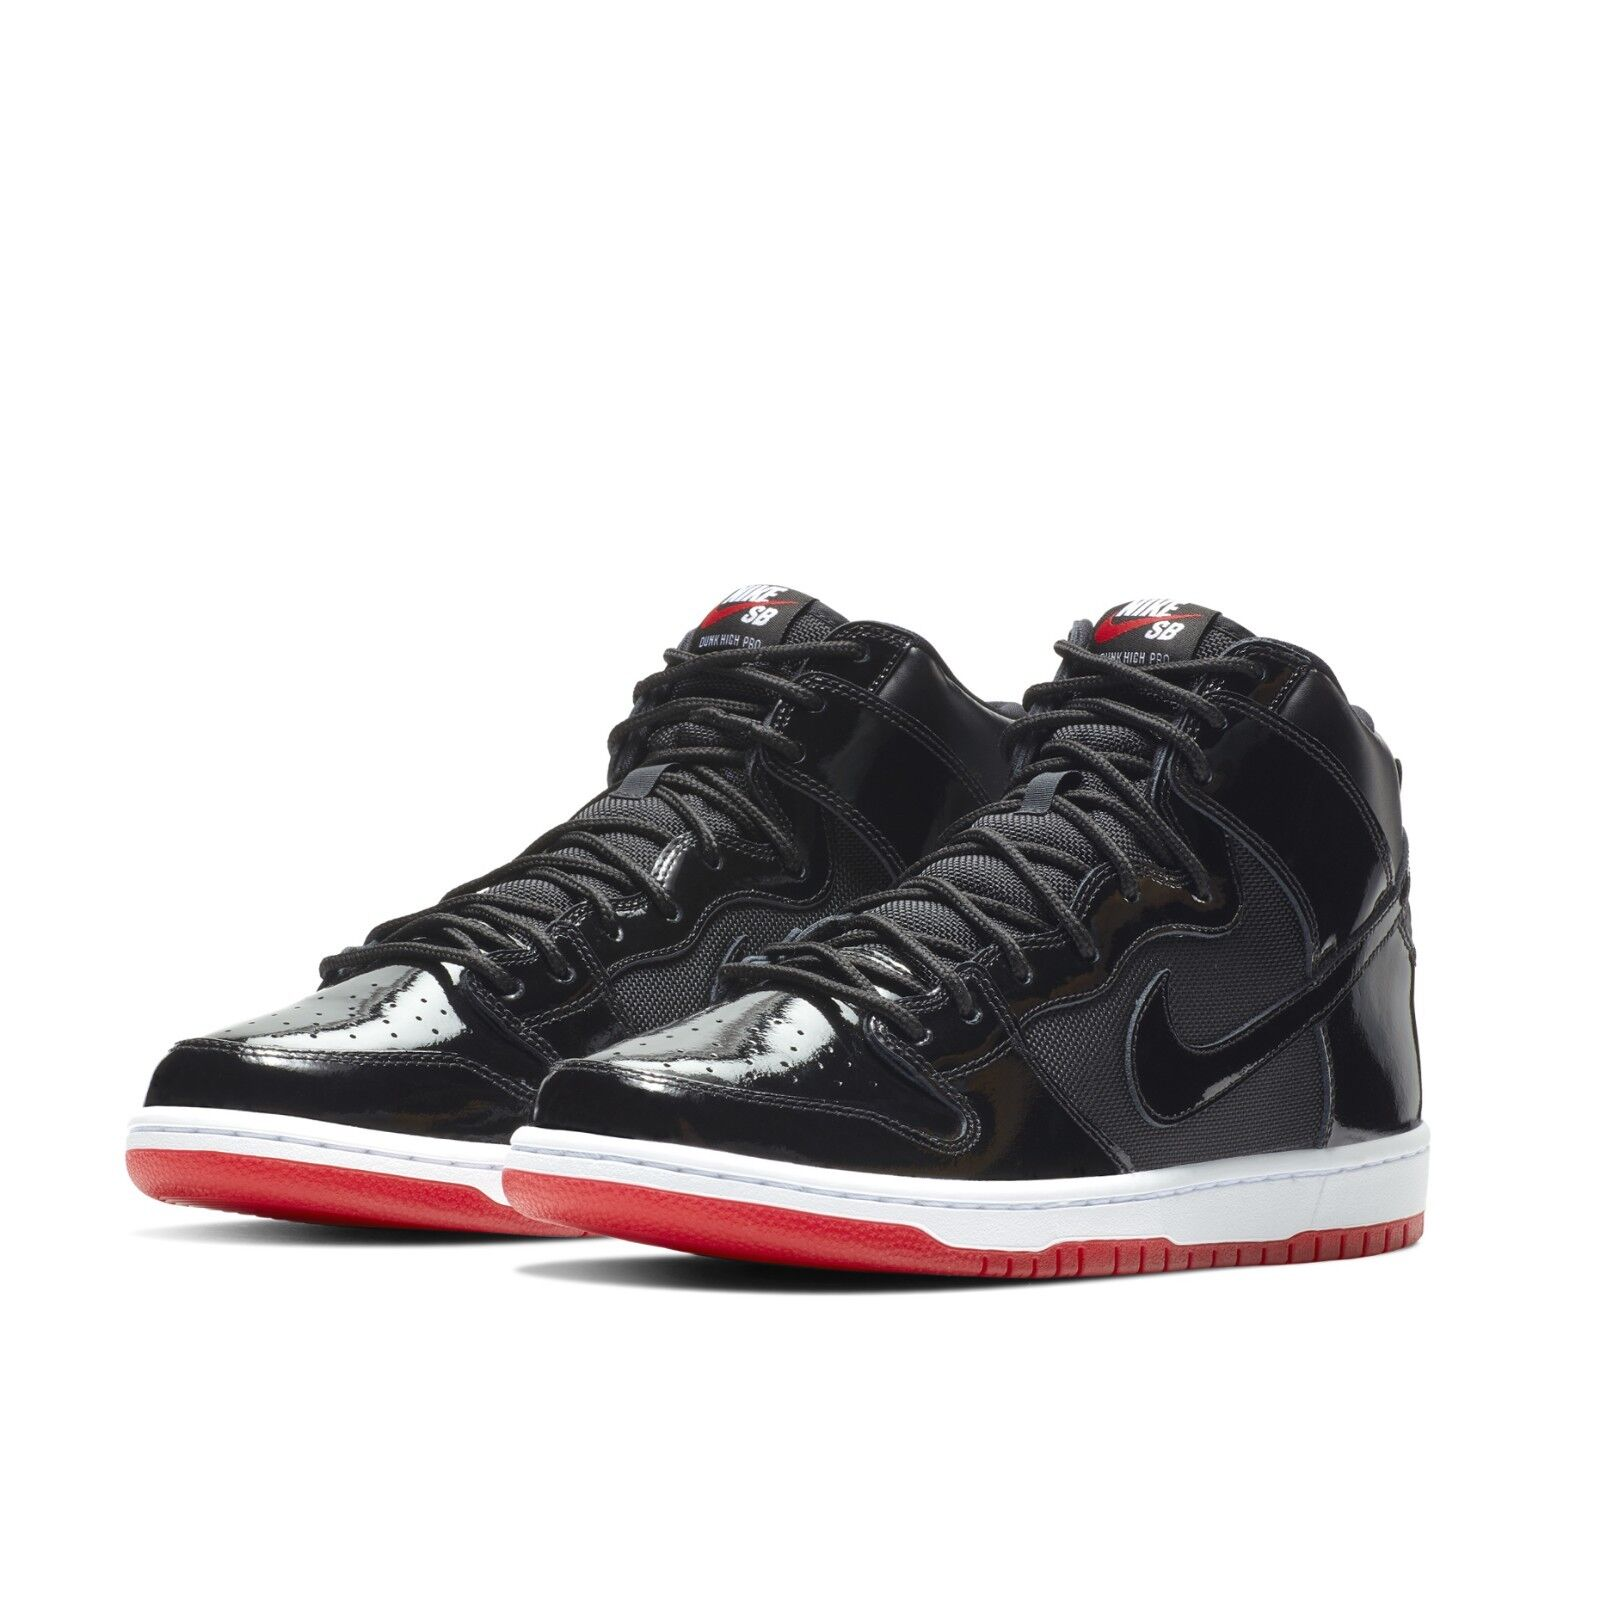 best sneakers d3430 b3eb4 ... clearance nike mens sb zoom dunk high tr qs rivals pack aj11 bred  skateboarding aj7730 001